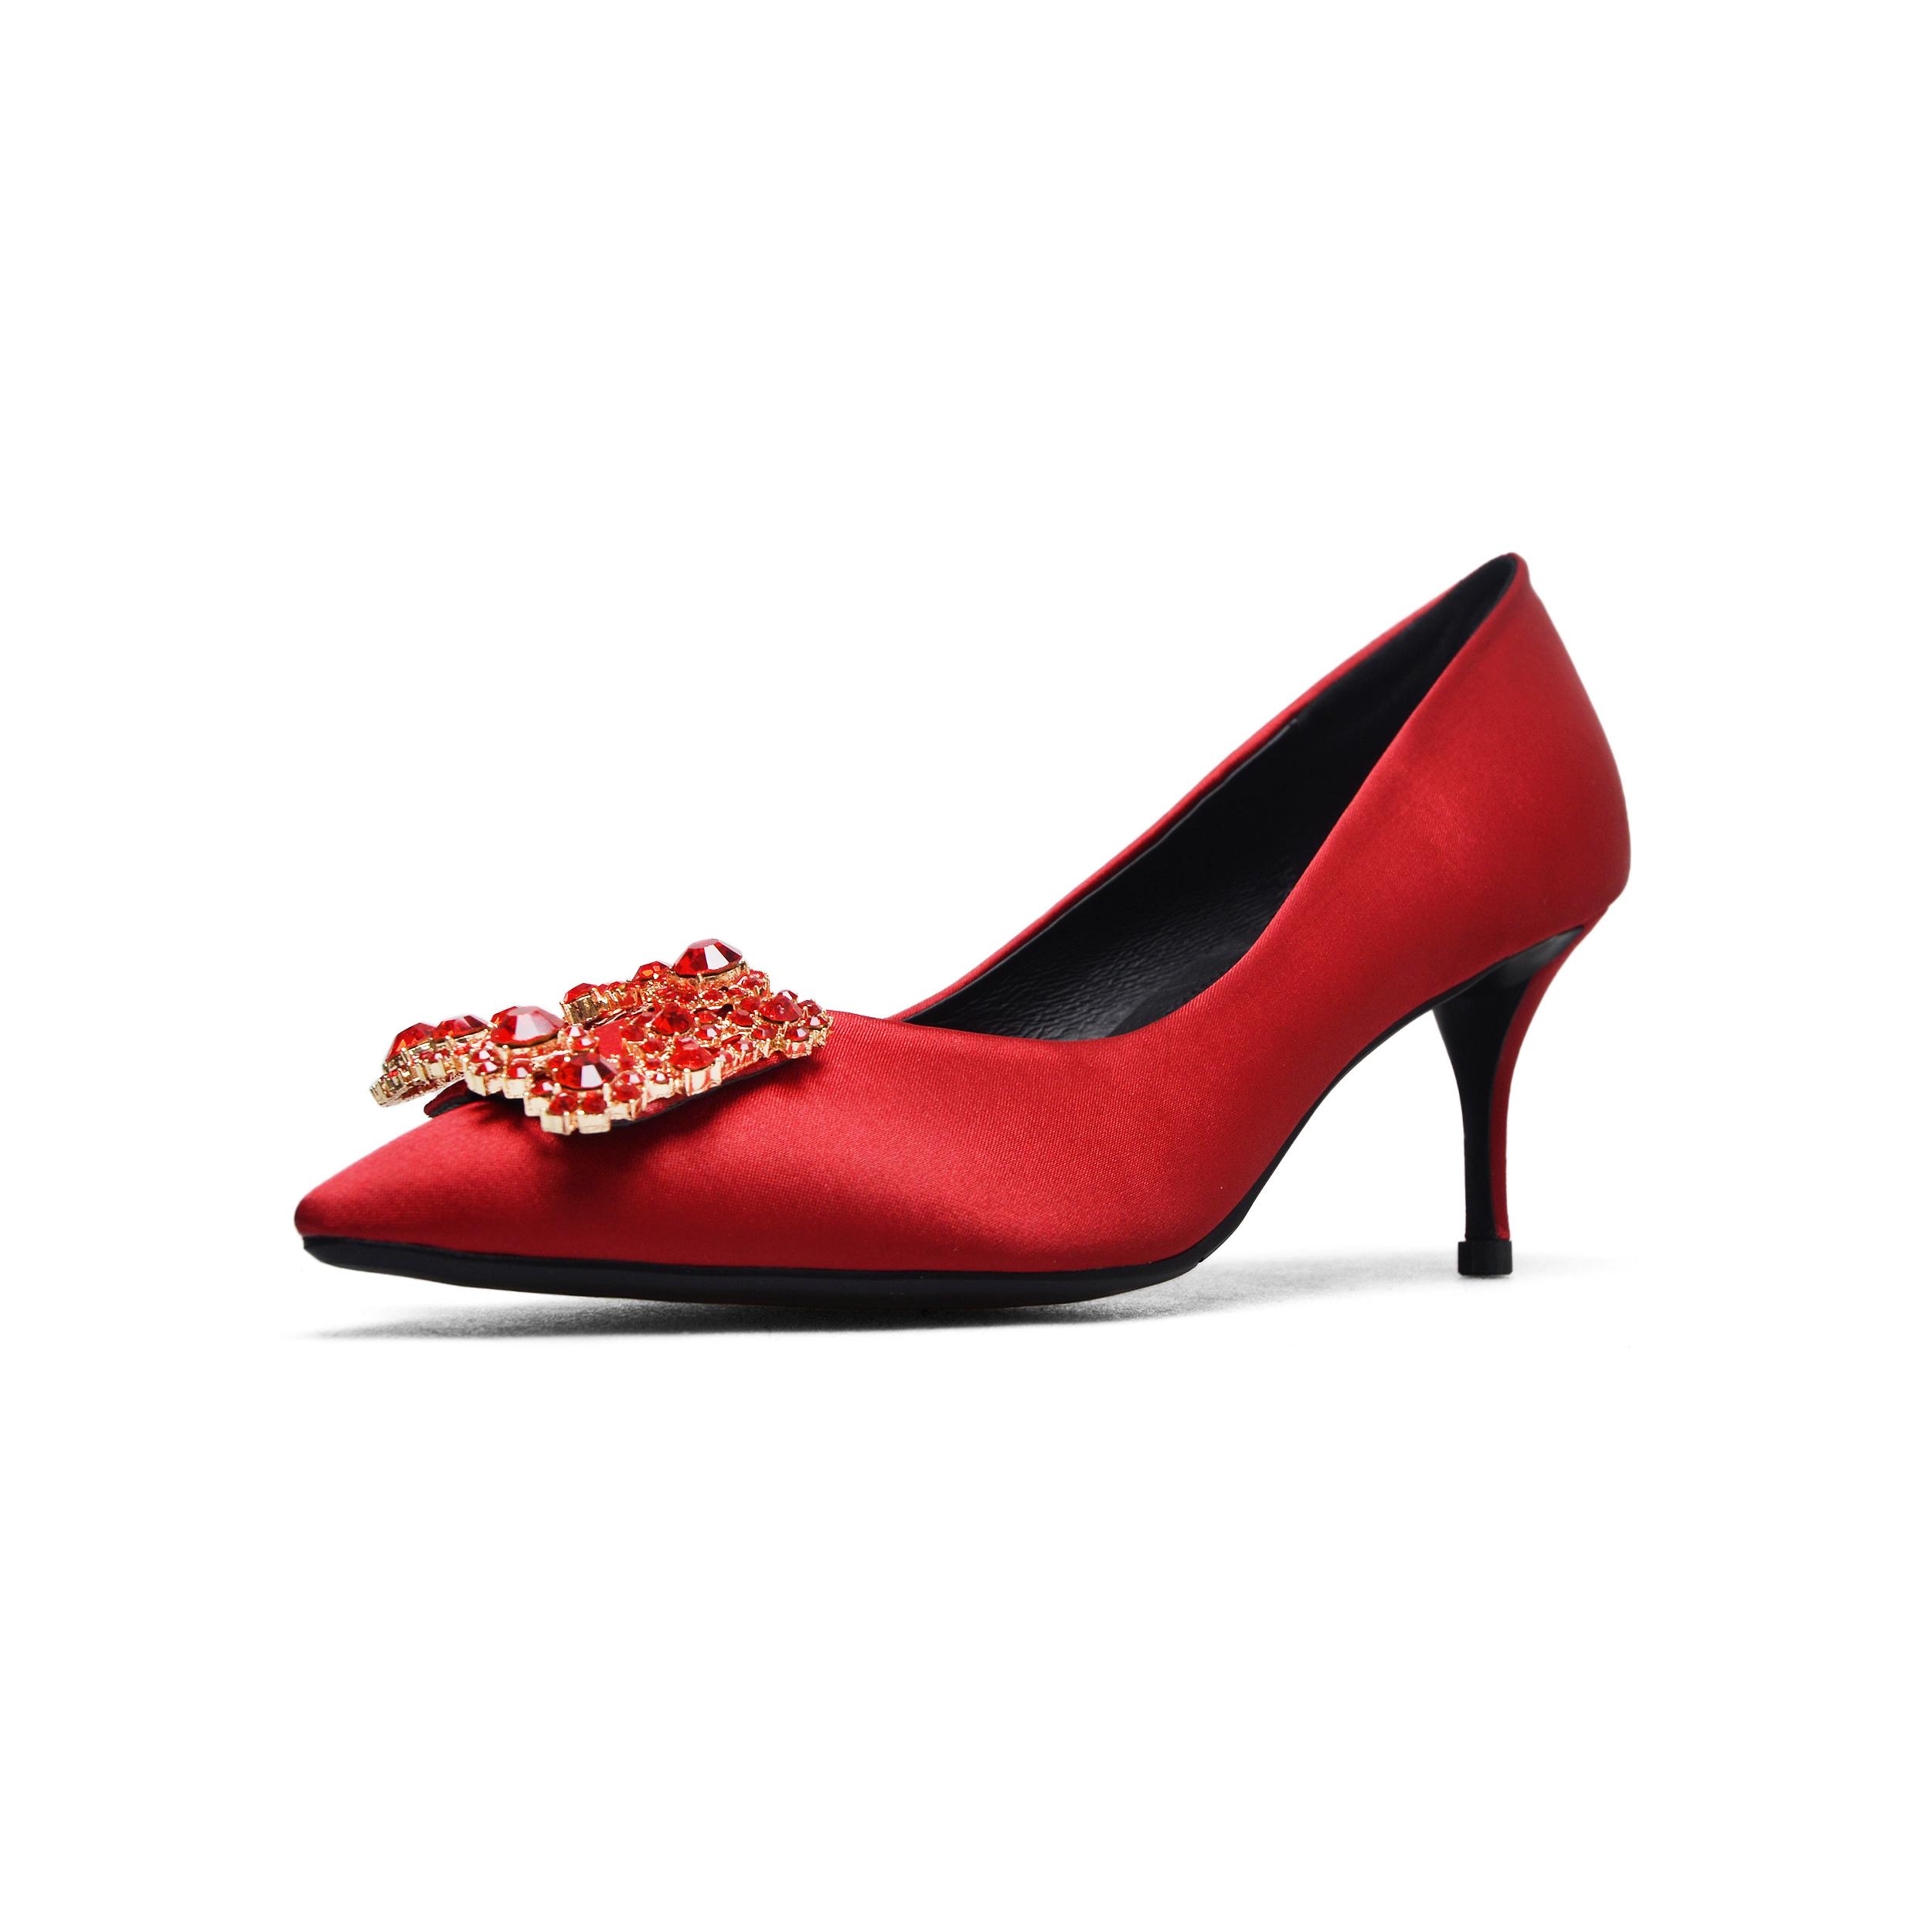 efb3d7000e40b US  52 - Arden Furtado 2018 spring autumn fashion sexy high heels office  lady crystal flowers size 40-43 red blue satin pumps stilettos -  www.ardenfurtado. ...